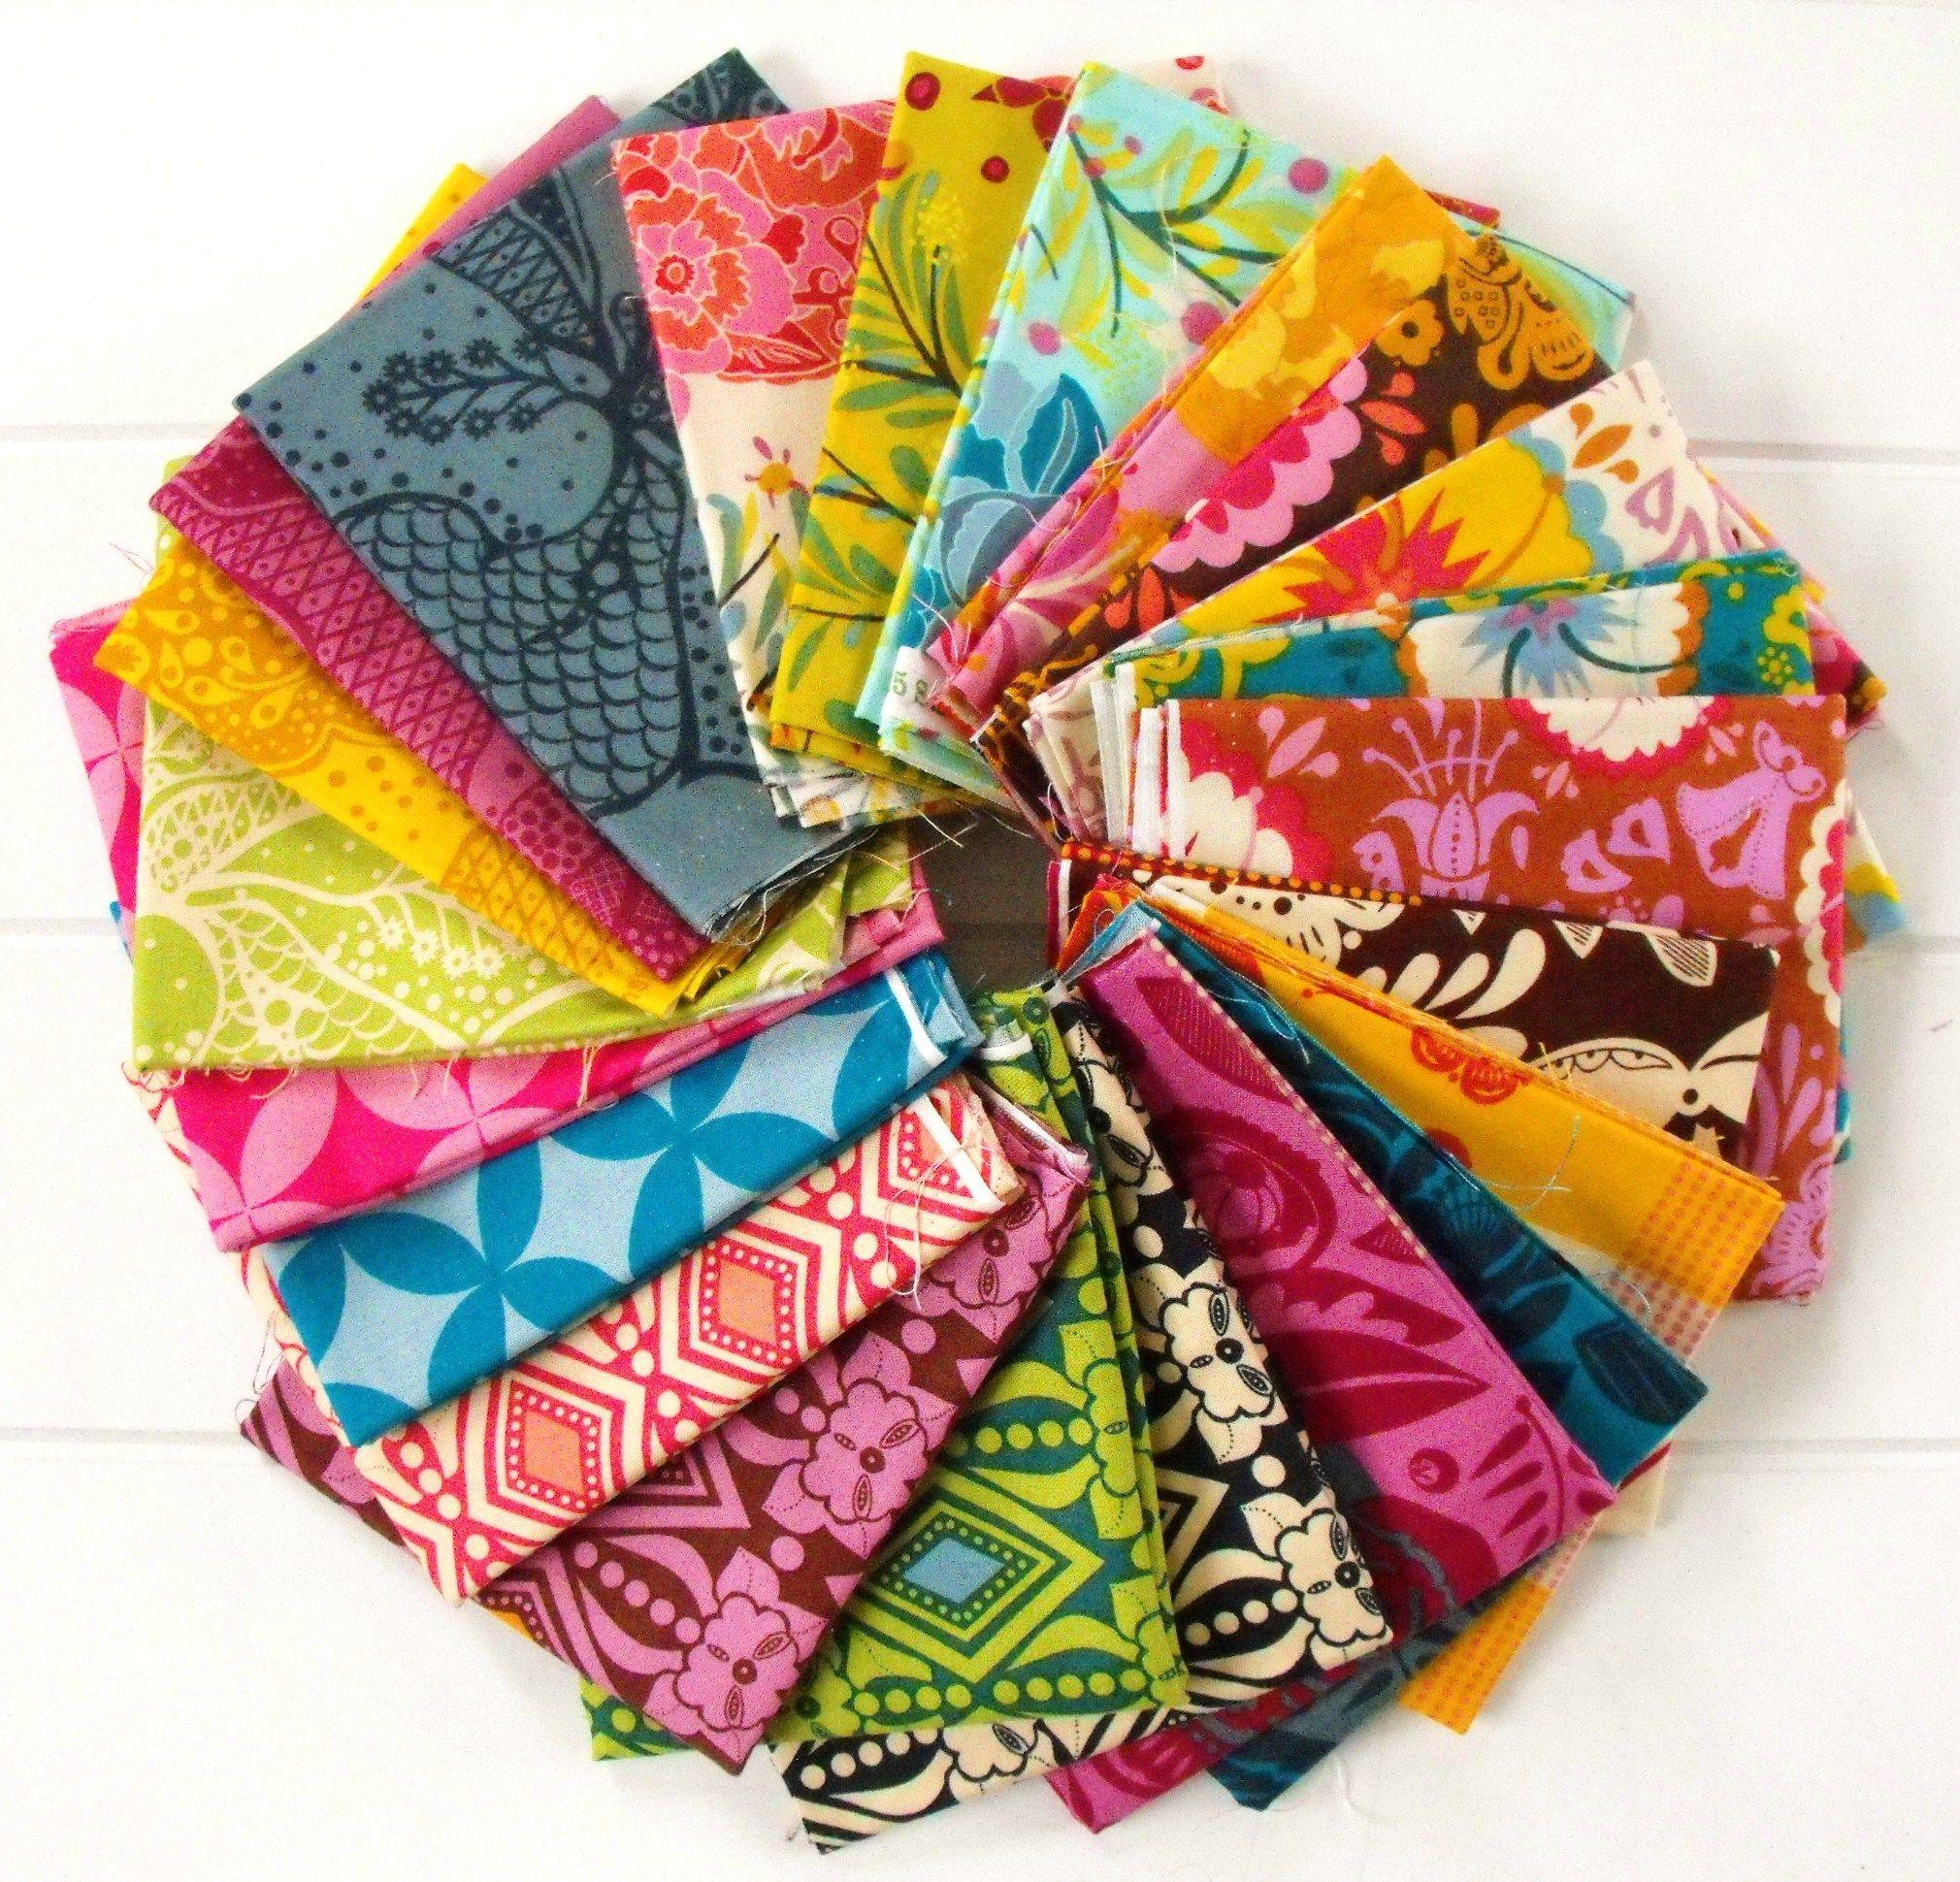 The Pros and Cons of Prewashing Quilting Fabrics | Fabrics, Photo ... : prewash quilt fabric - Adamdwight.com